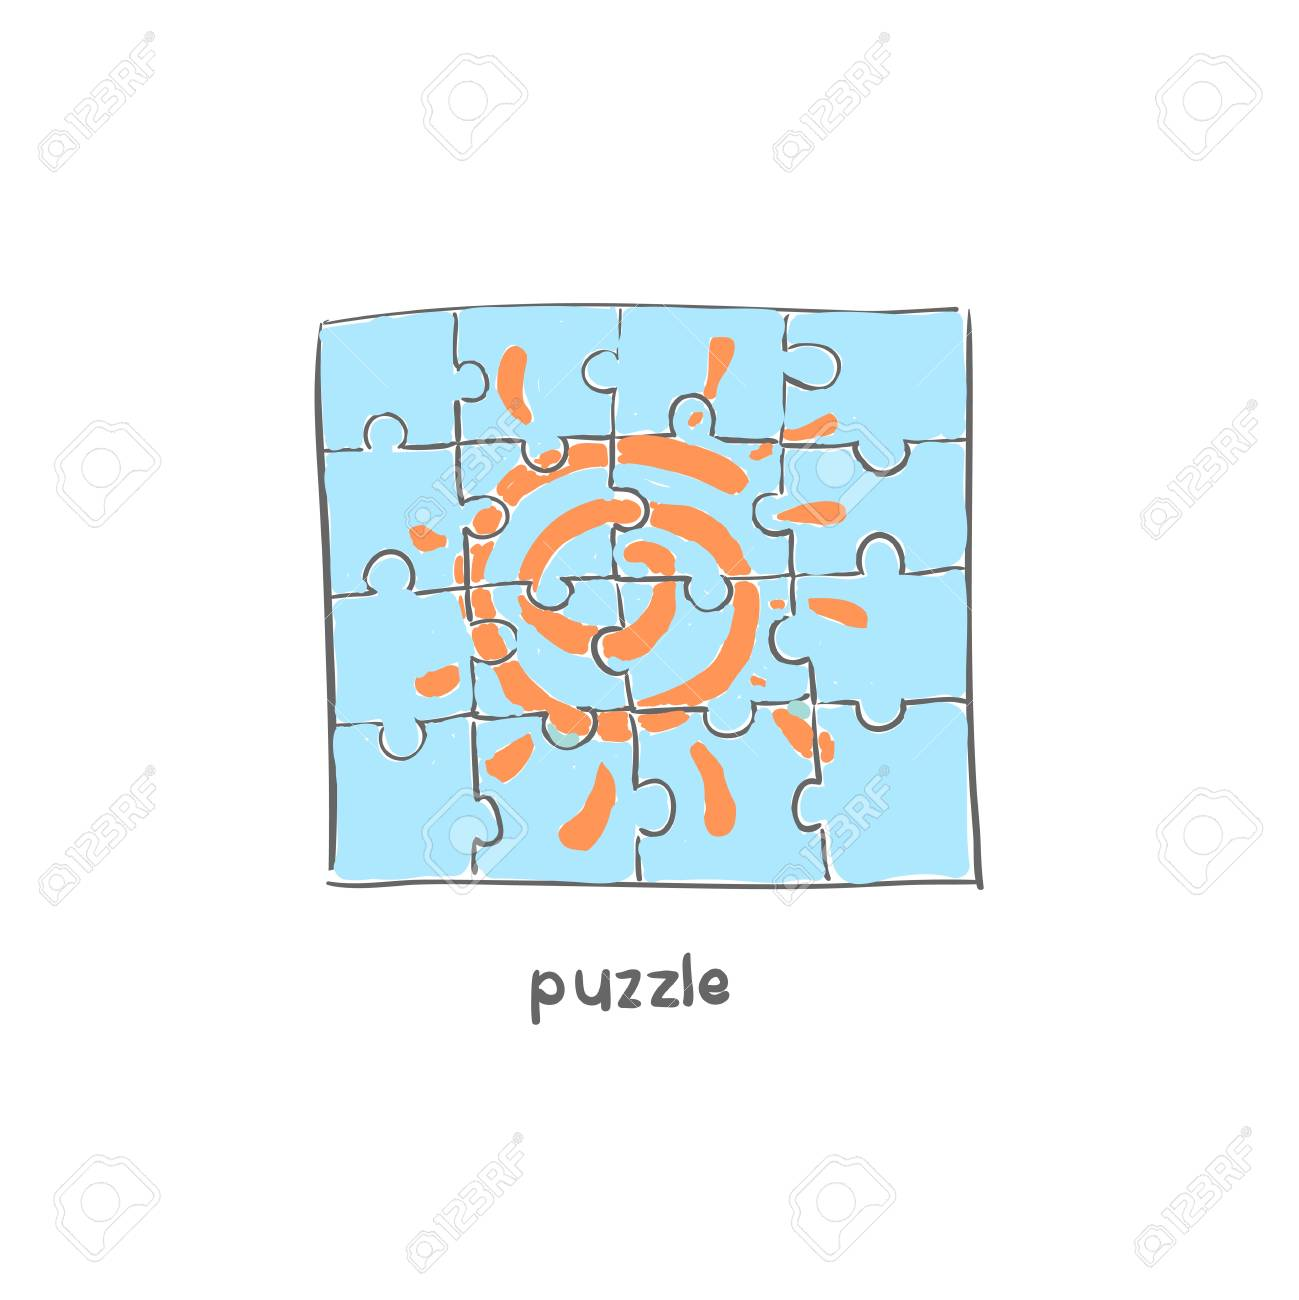 Puzzle. Illustration. Stock Vector - 18035558